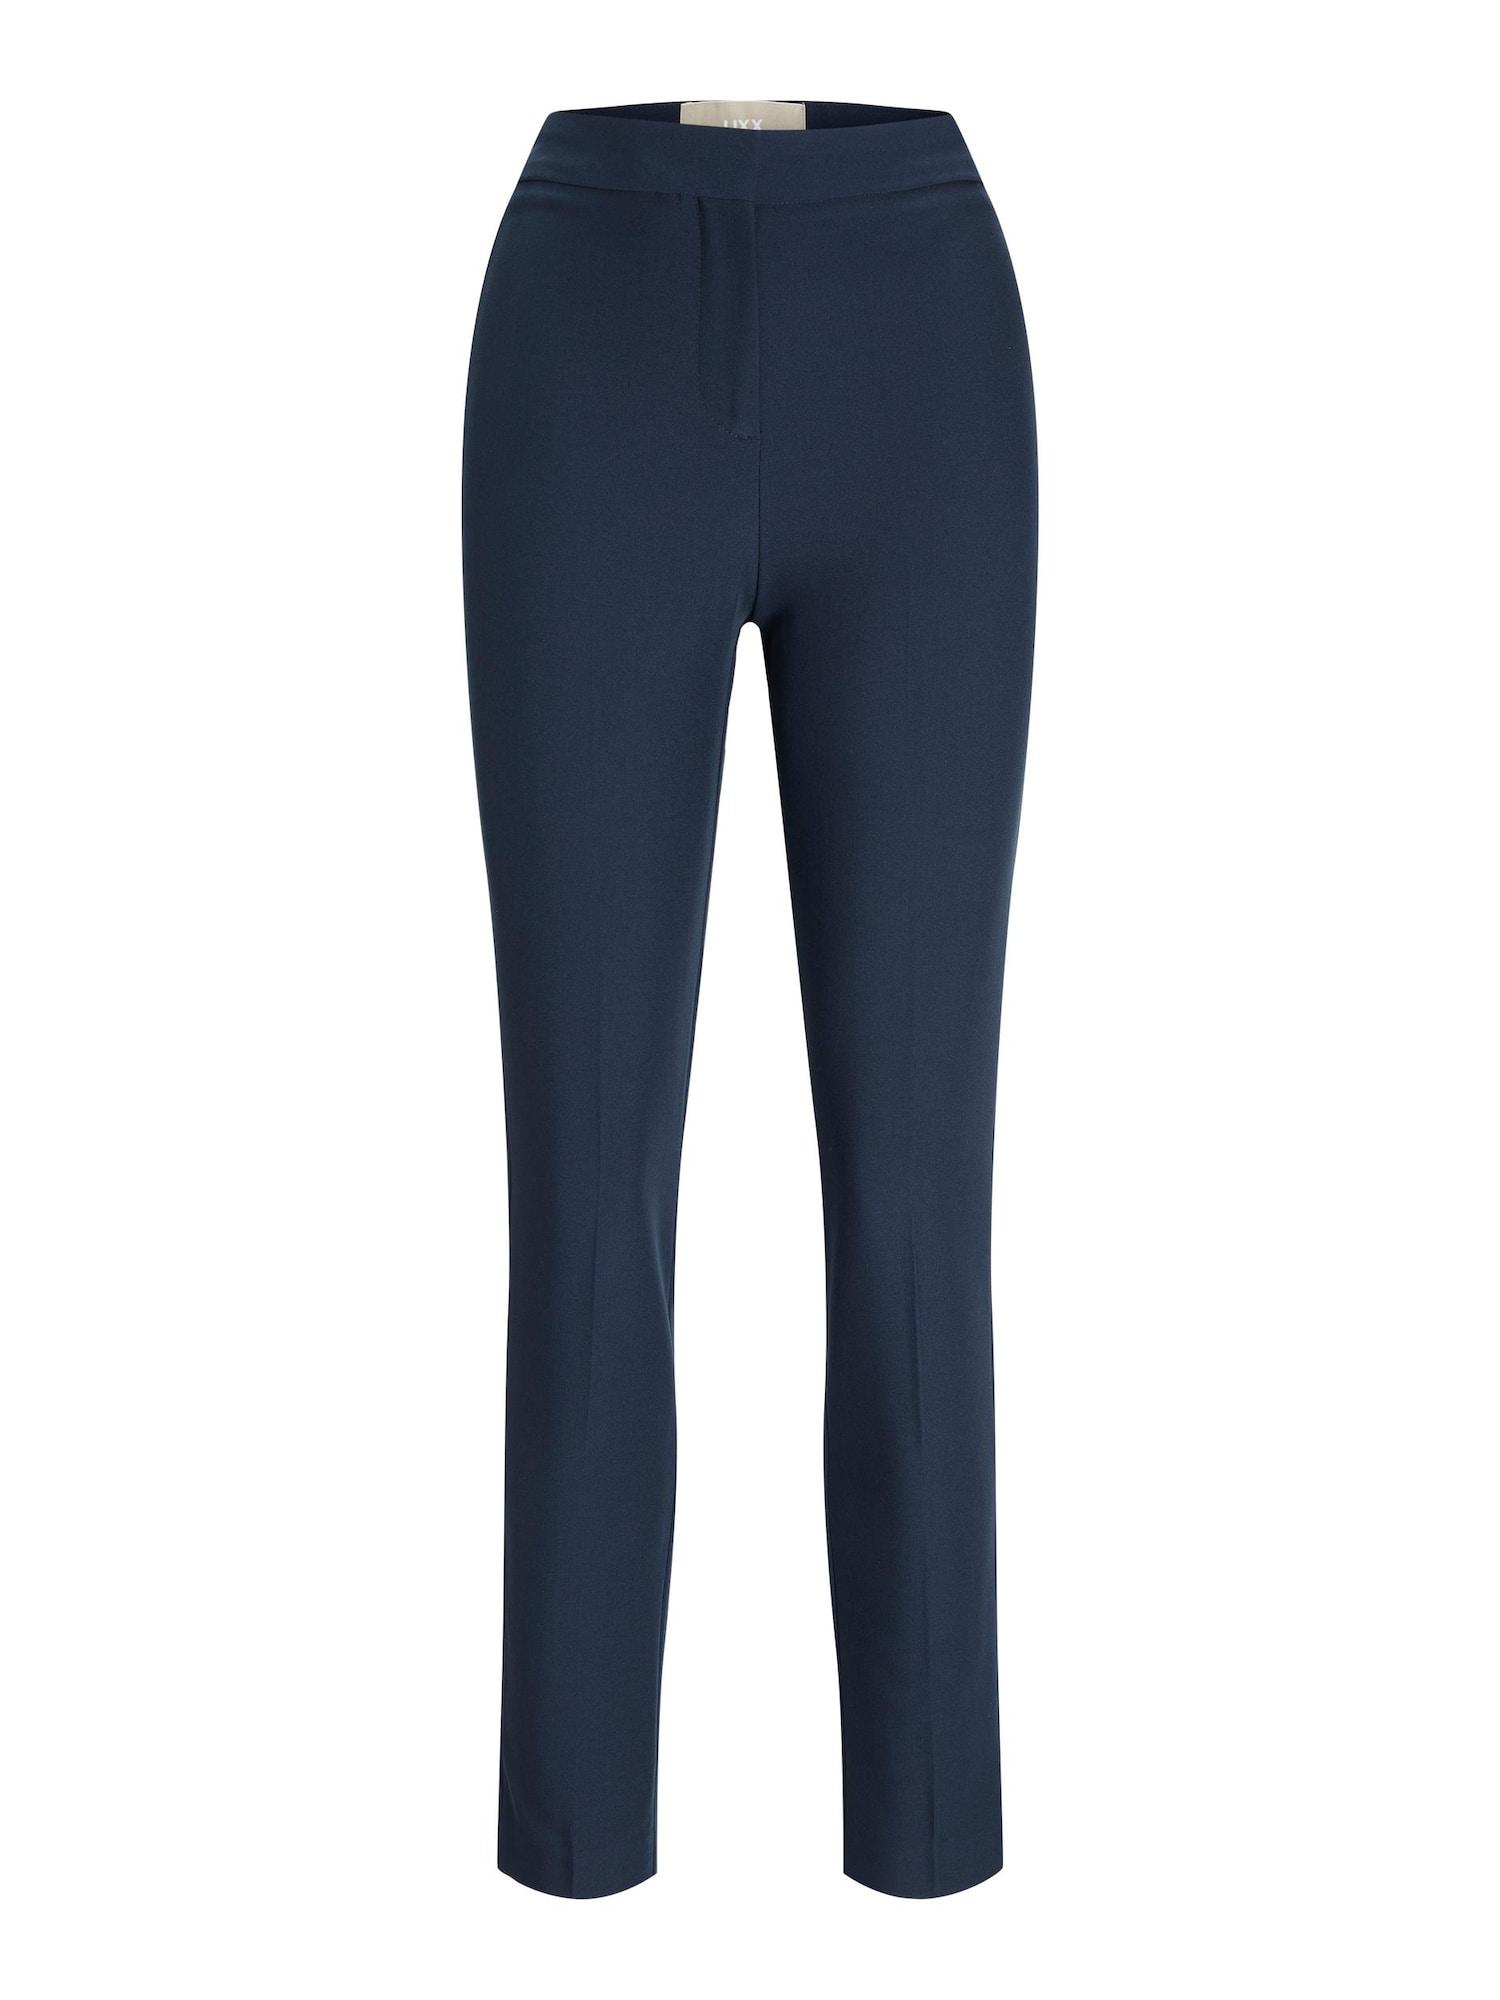 JJXX Kalhoty 'JXKATIE'  tmavě modrá